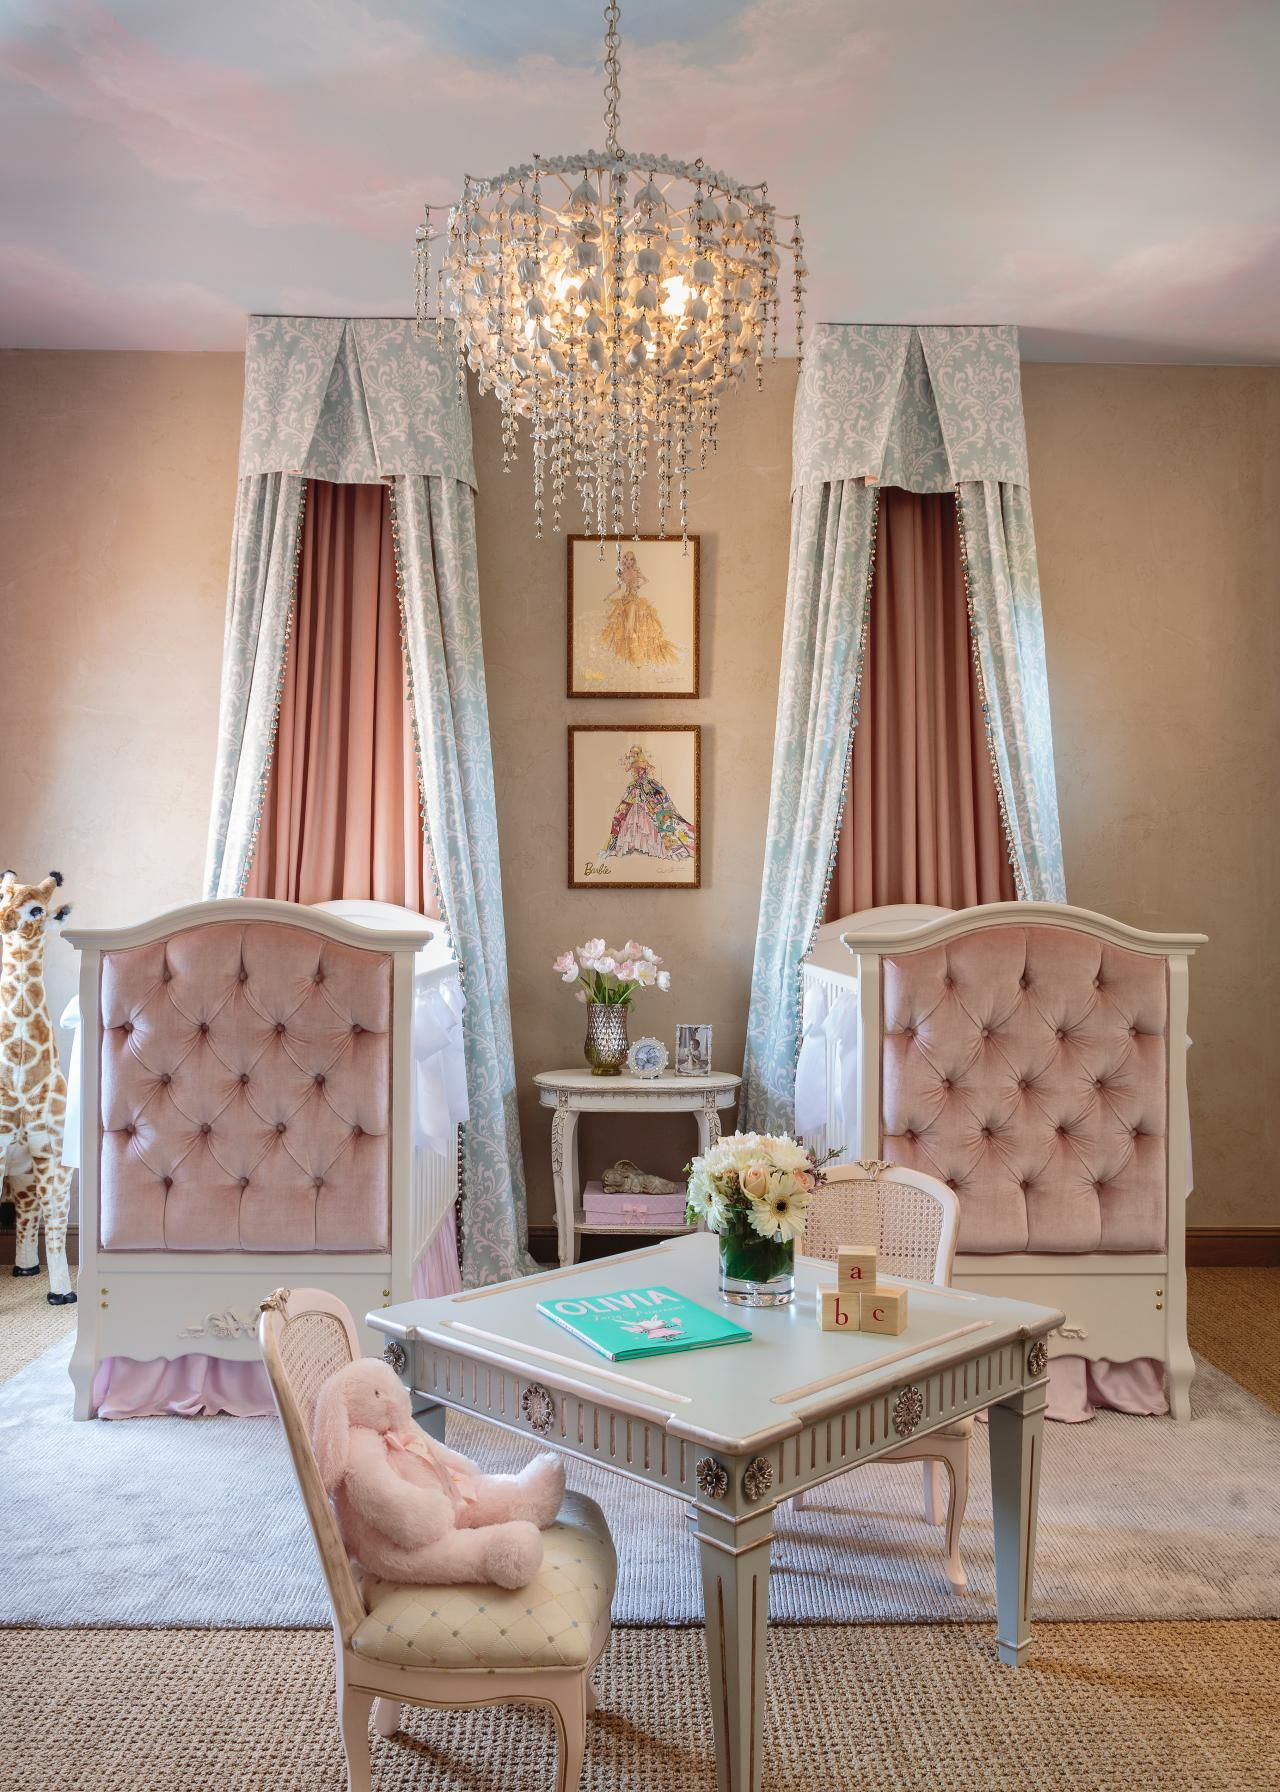 Incorporating Rose Quartz And Serenity Into Your Nursery Decor